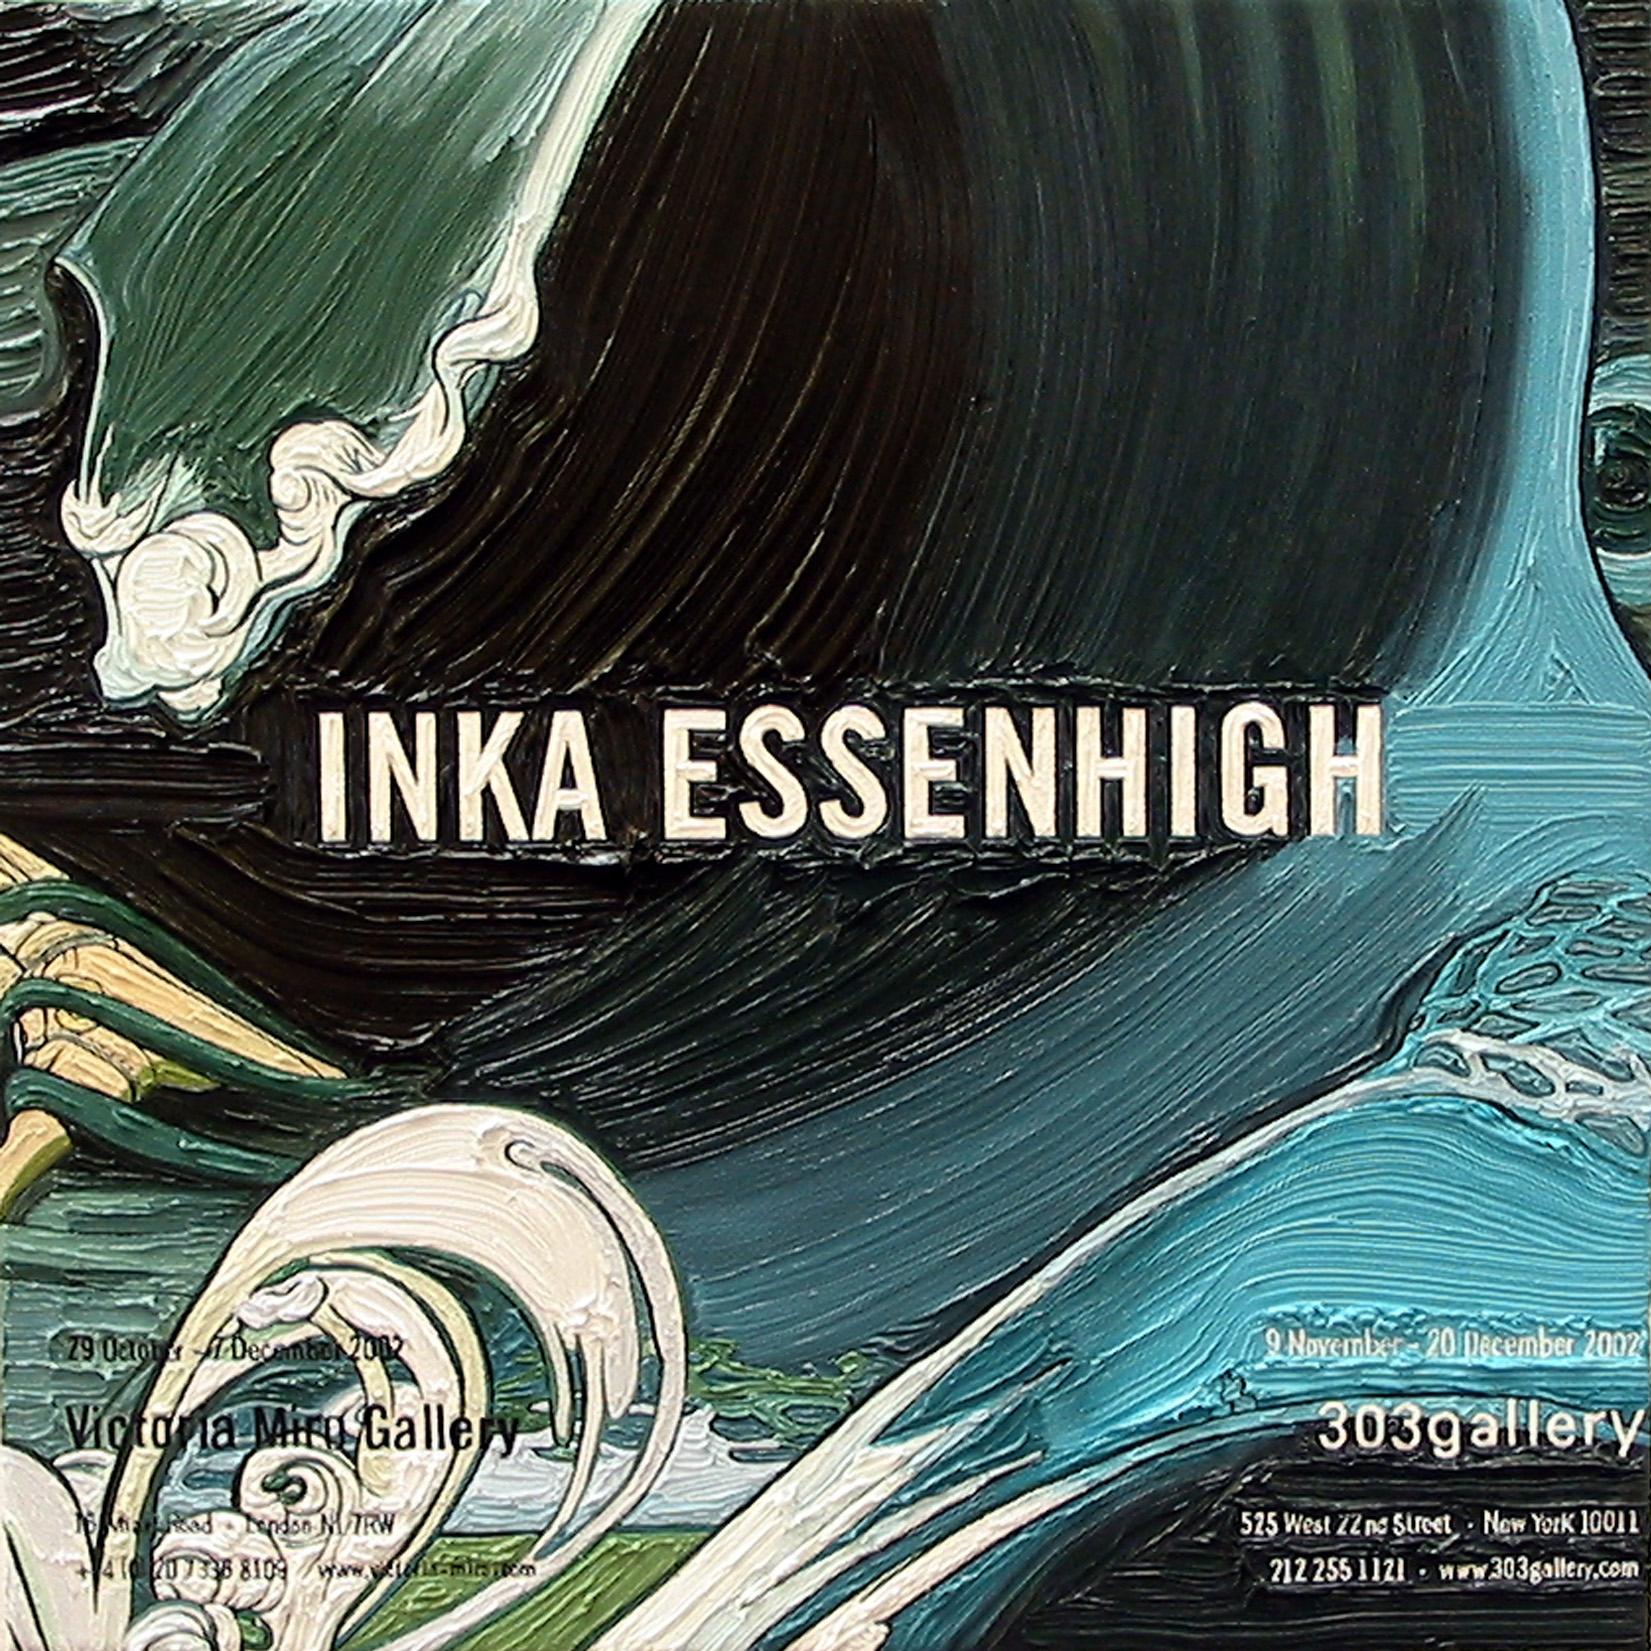 Inka Essenhigh at Victoria Miro and 303